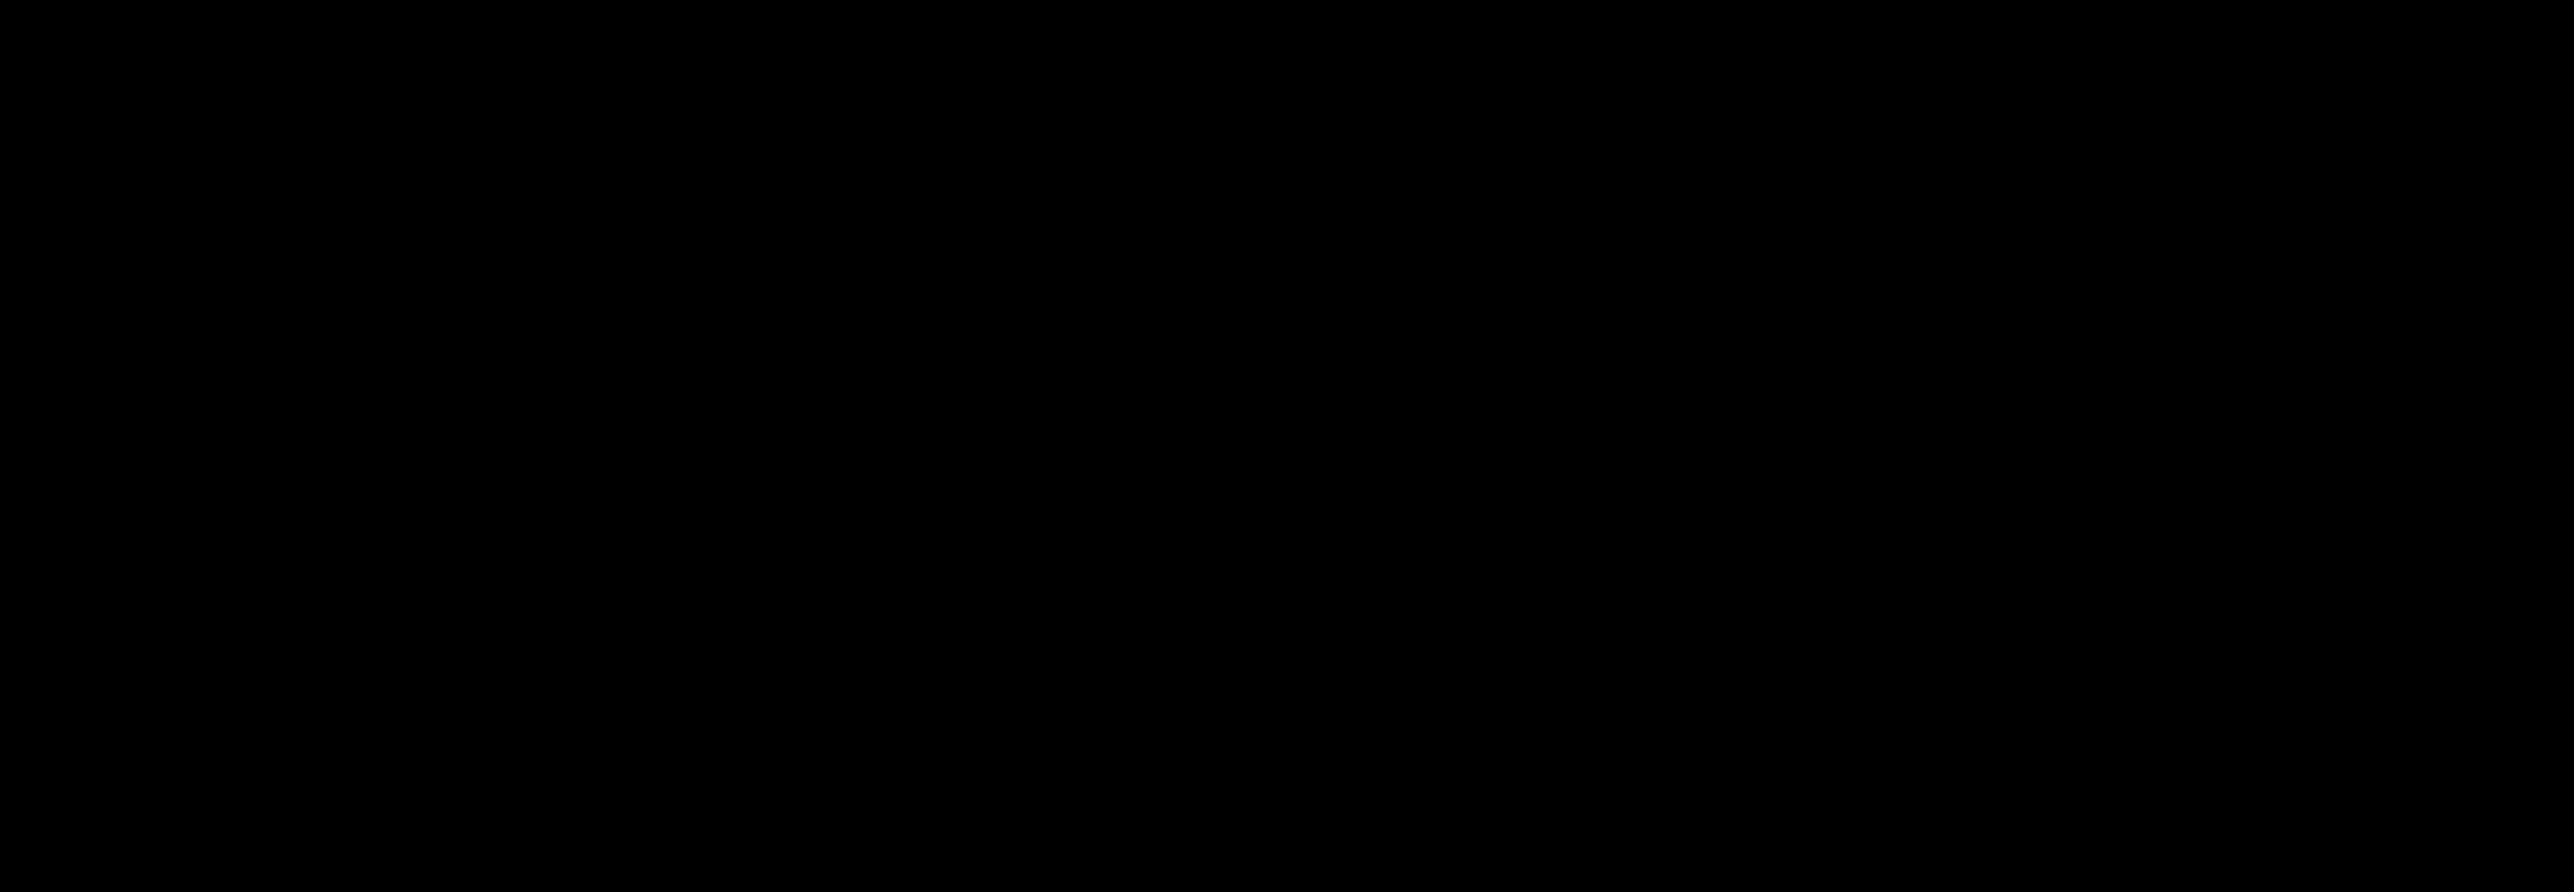 Aplysamine-d<sub>3</sub> 4 hydrobromide